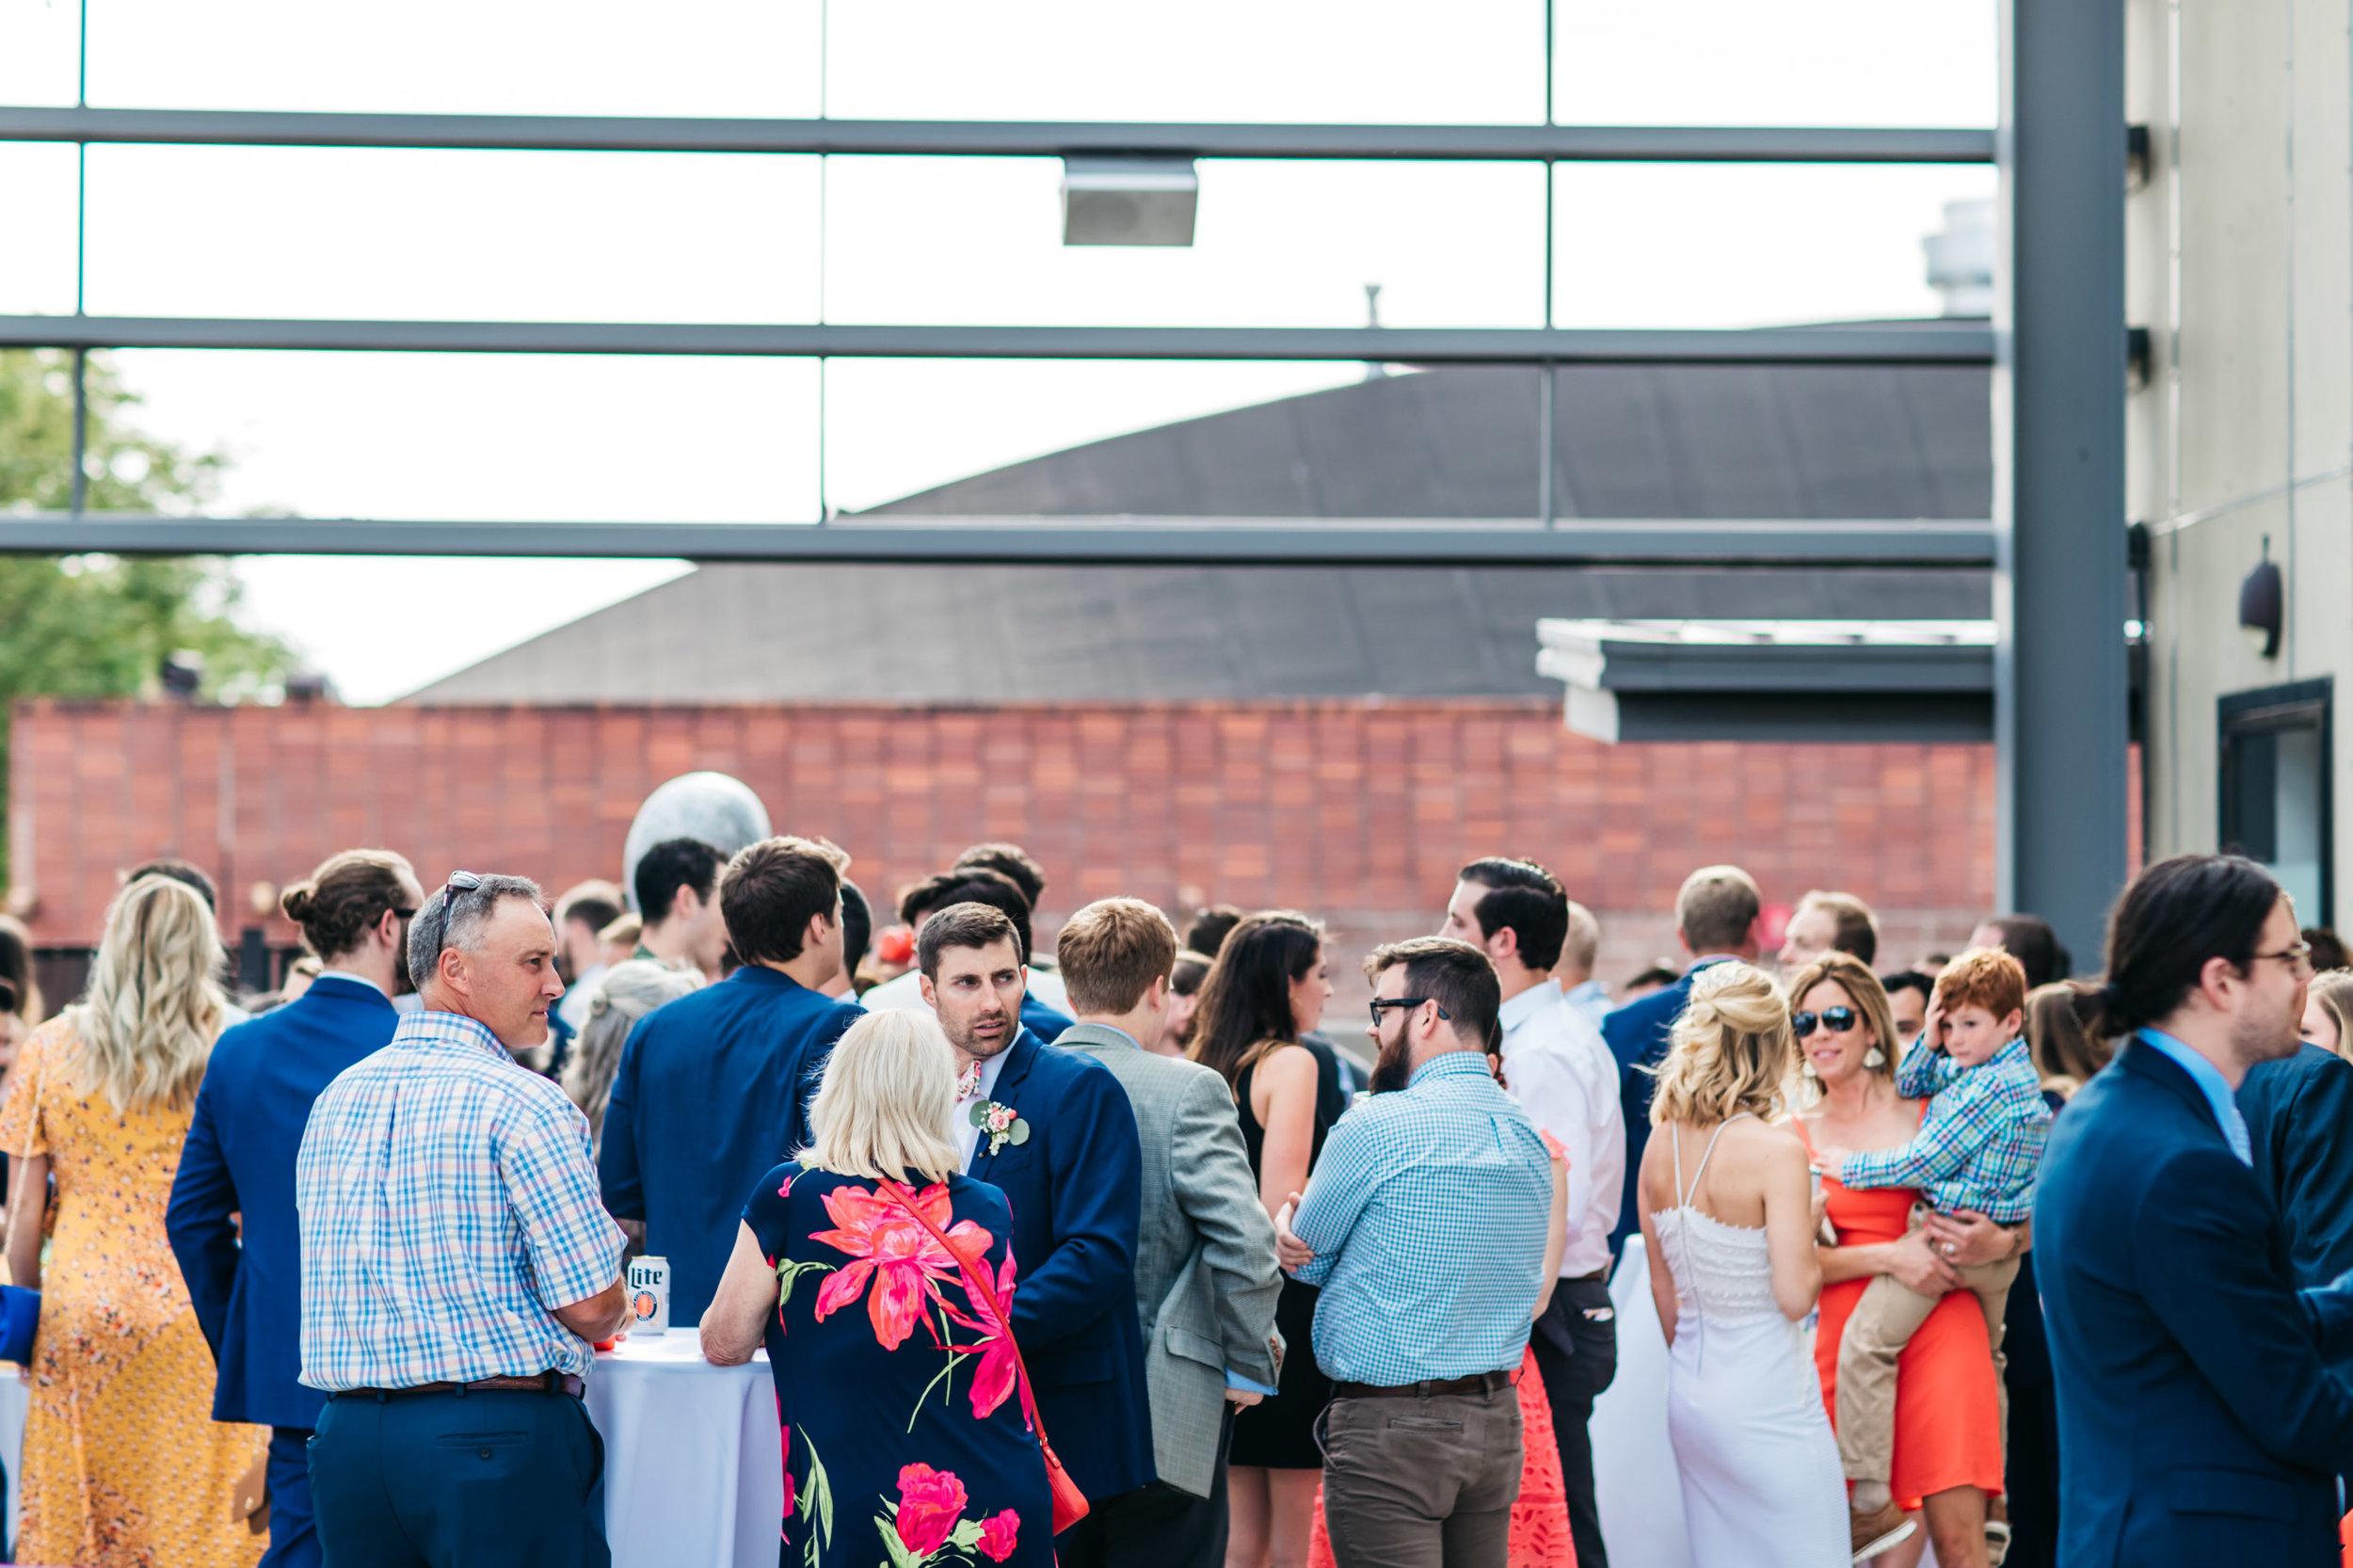 outdoor wedding space gallery in denver